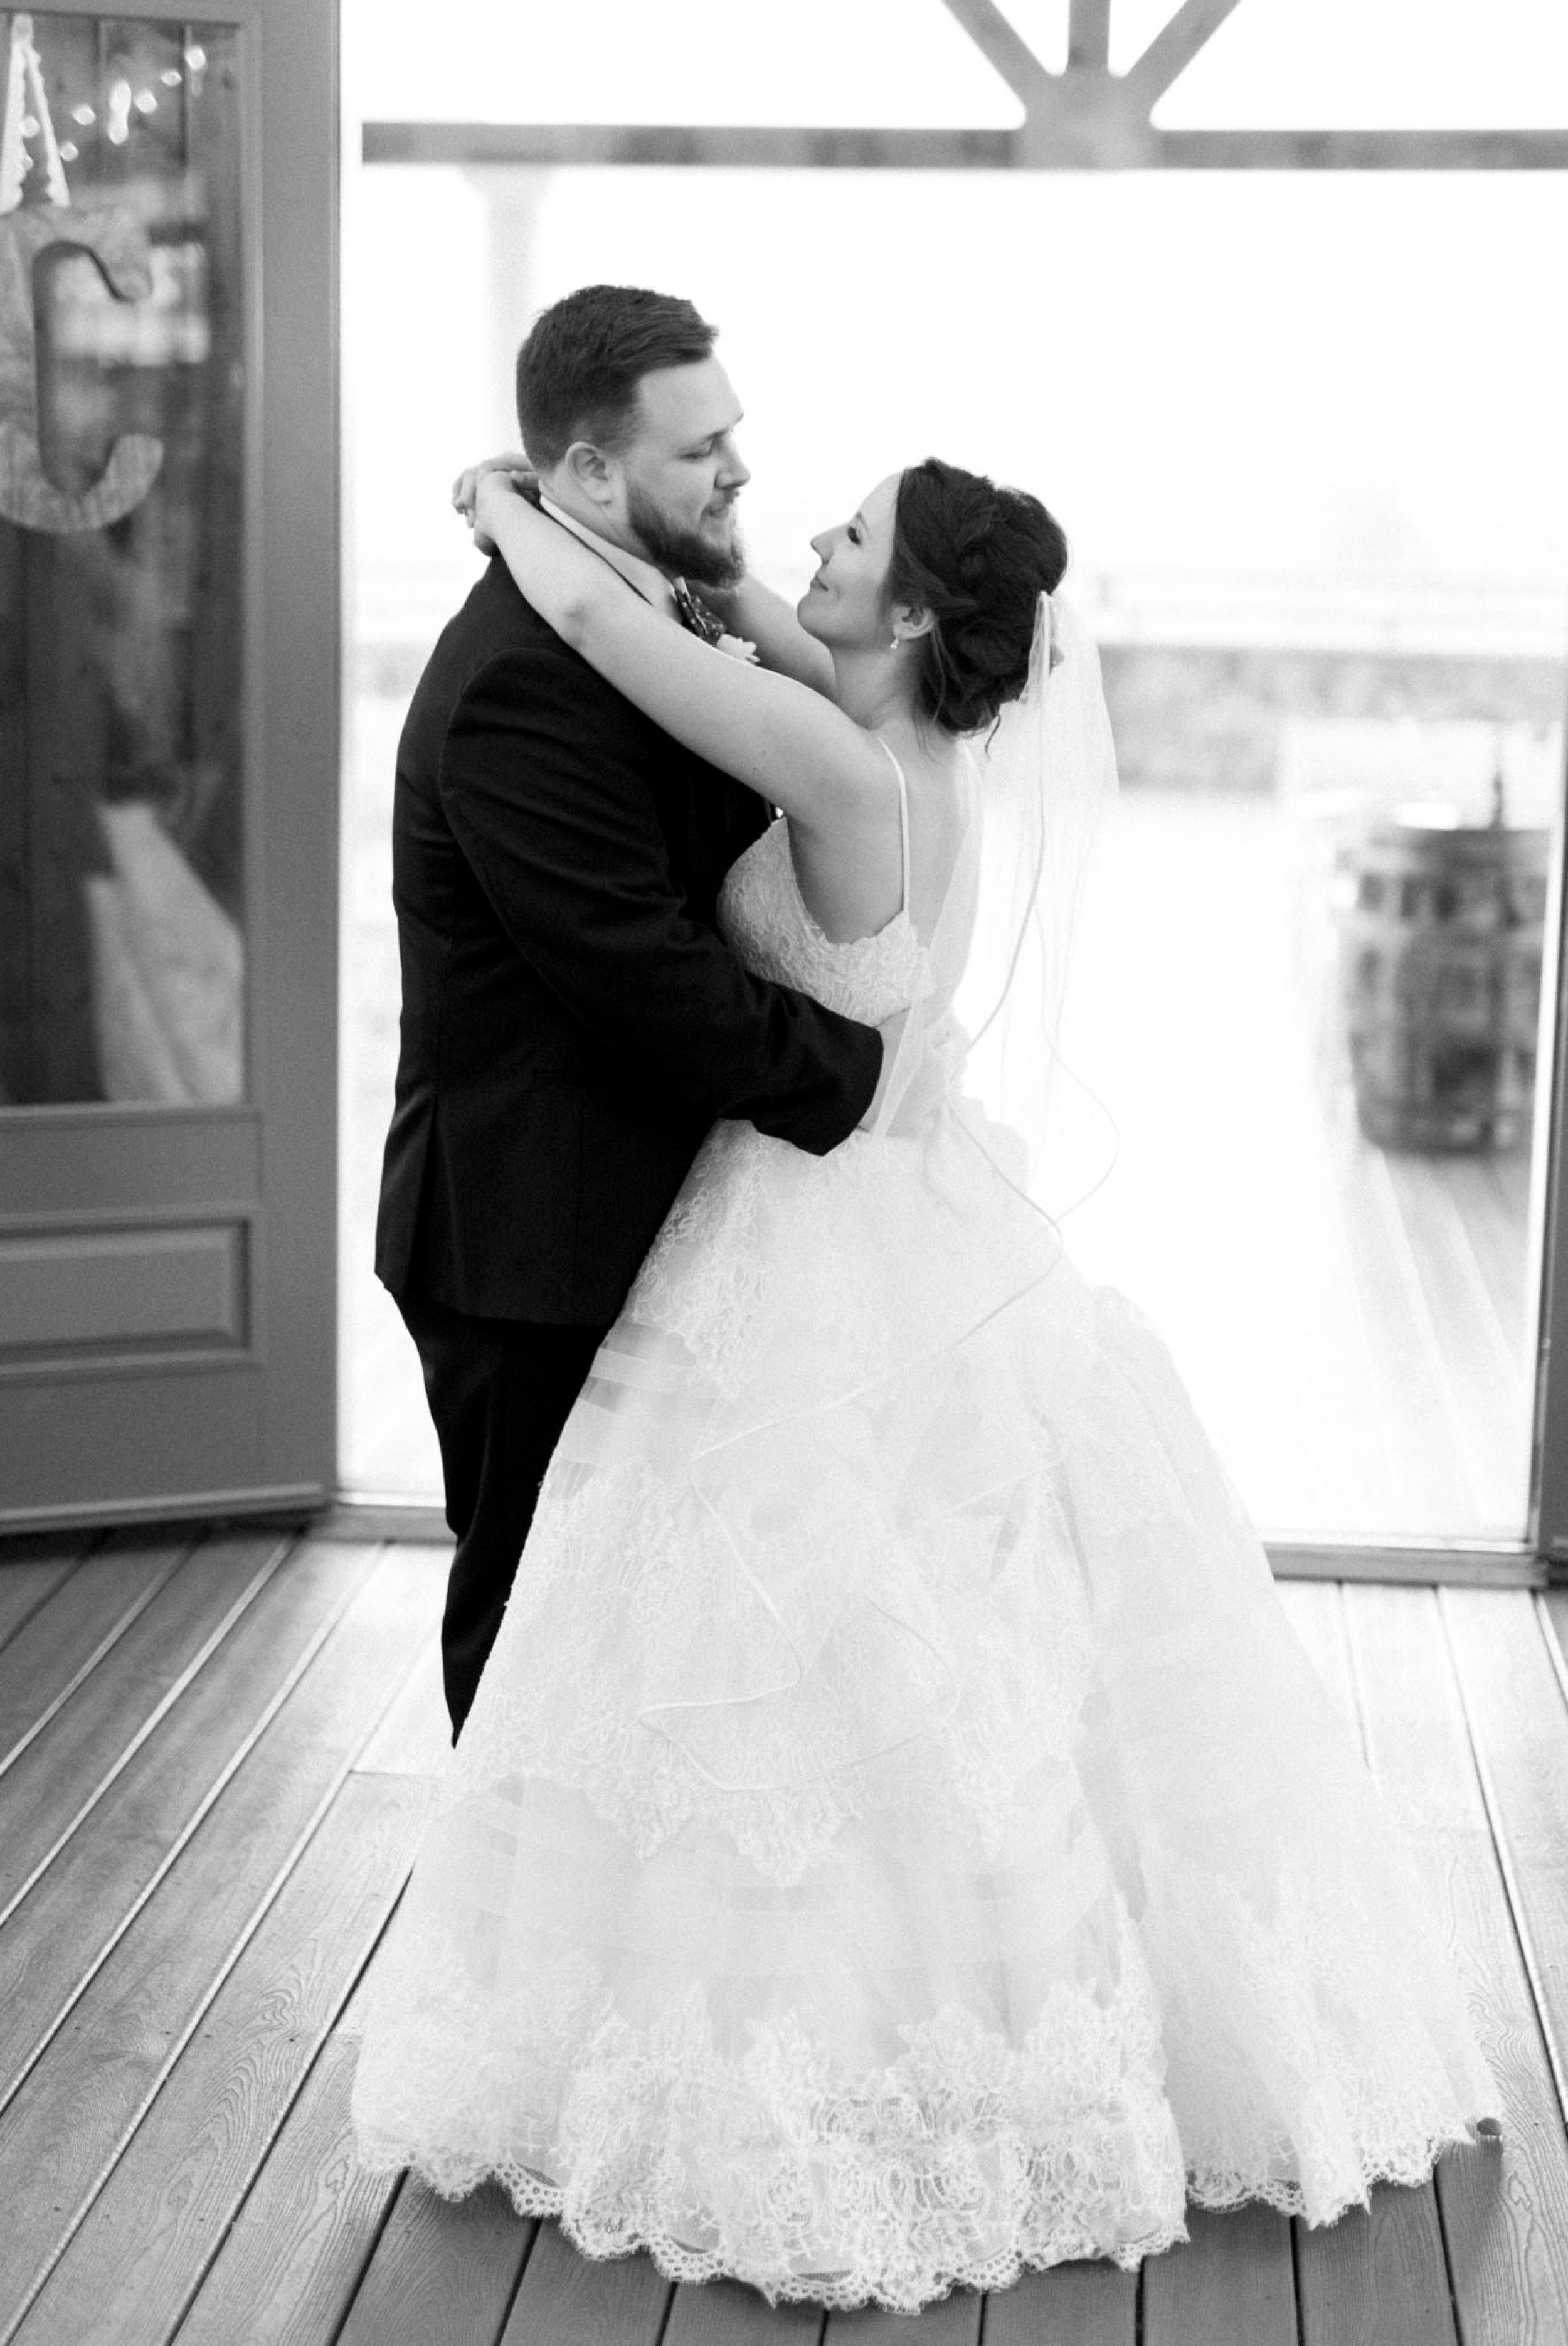 IrvineEstate_LexingtonVA_Wedding_FallWedding_VirginiaWeddingPhotographer 102.jpg